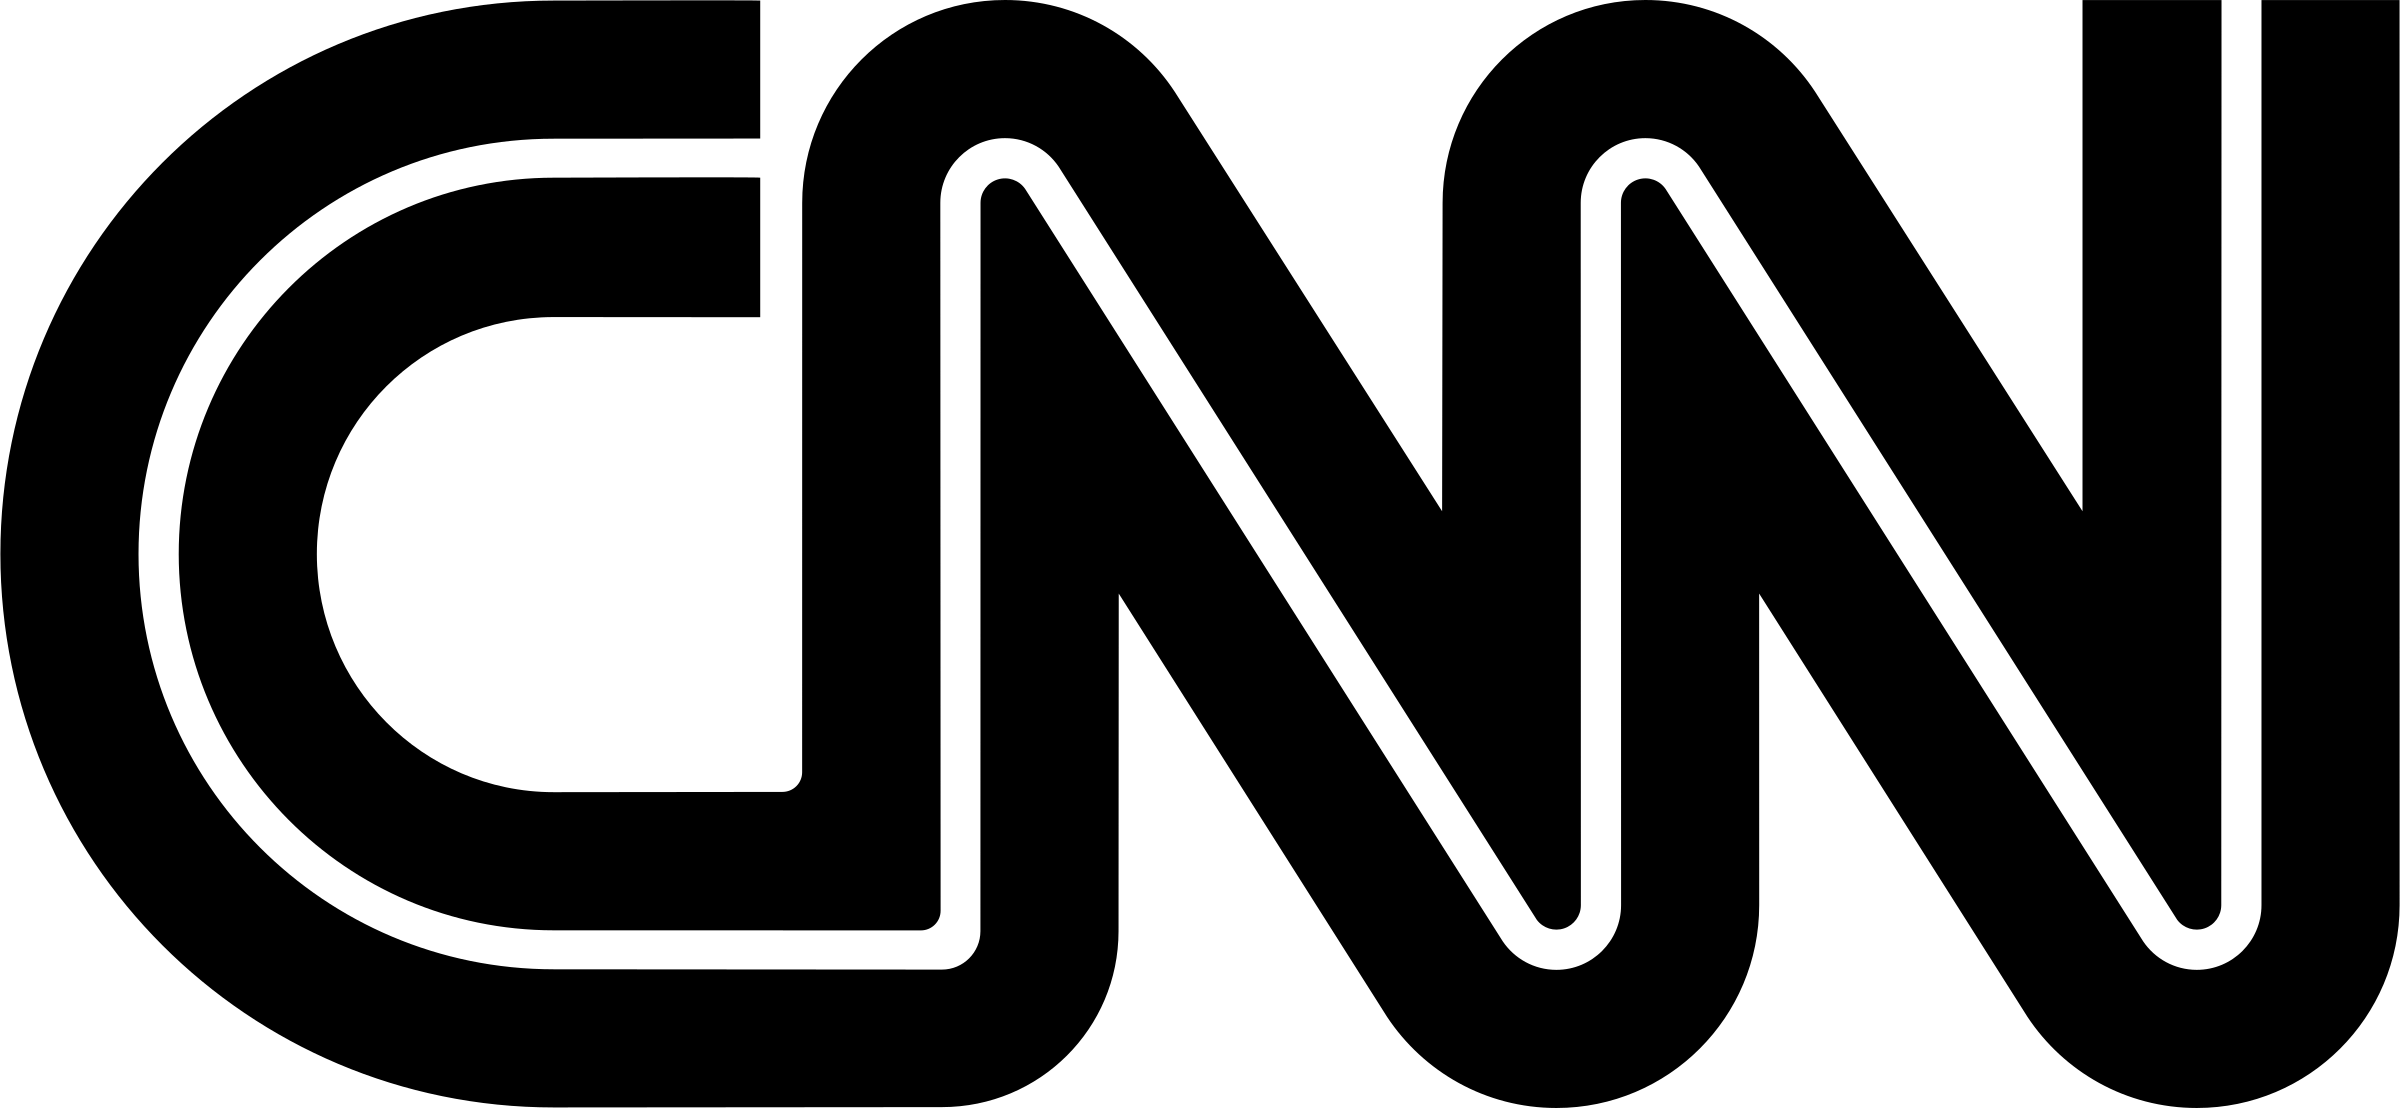 Cnn Logo Png Transparent &